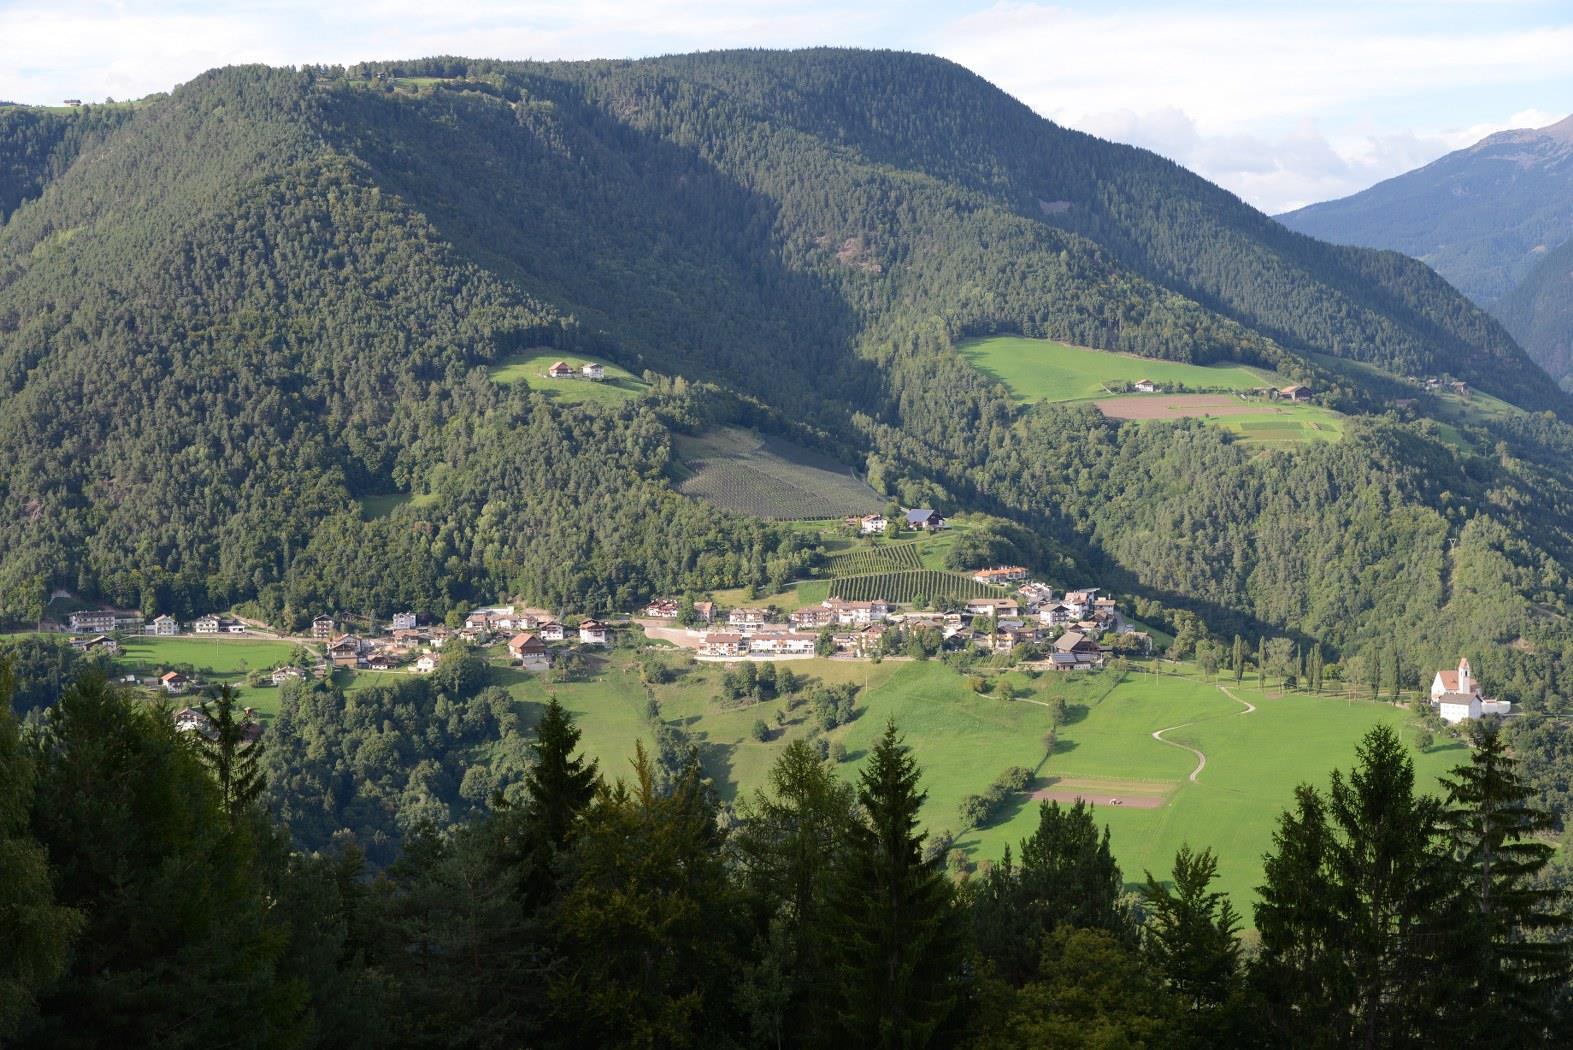 Sentiero circolare: San Genesio - Avigna